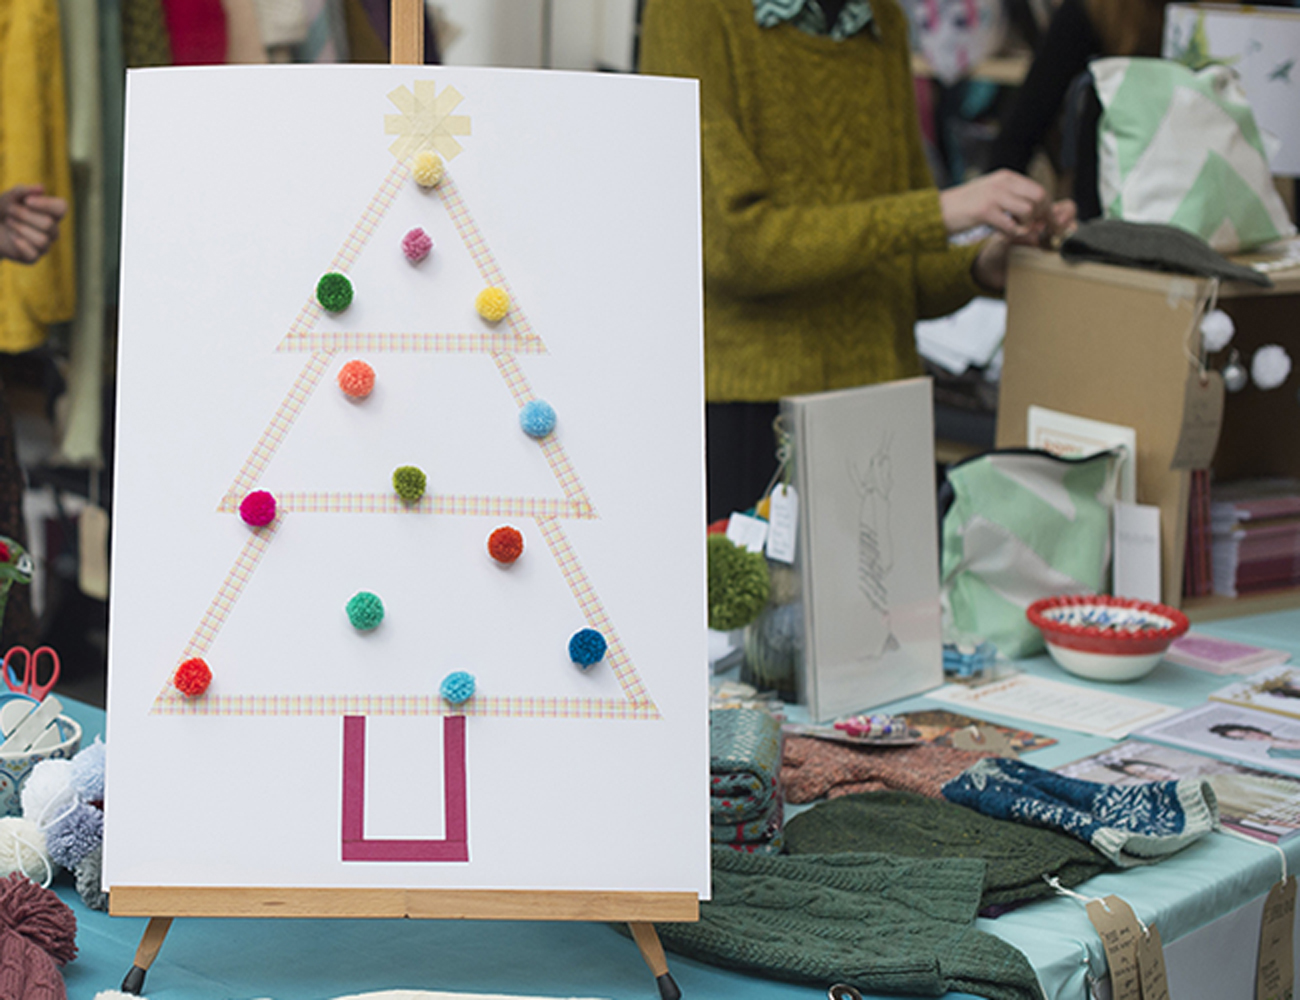 Renegade Craft Fair: Indie Crafts for It Girls